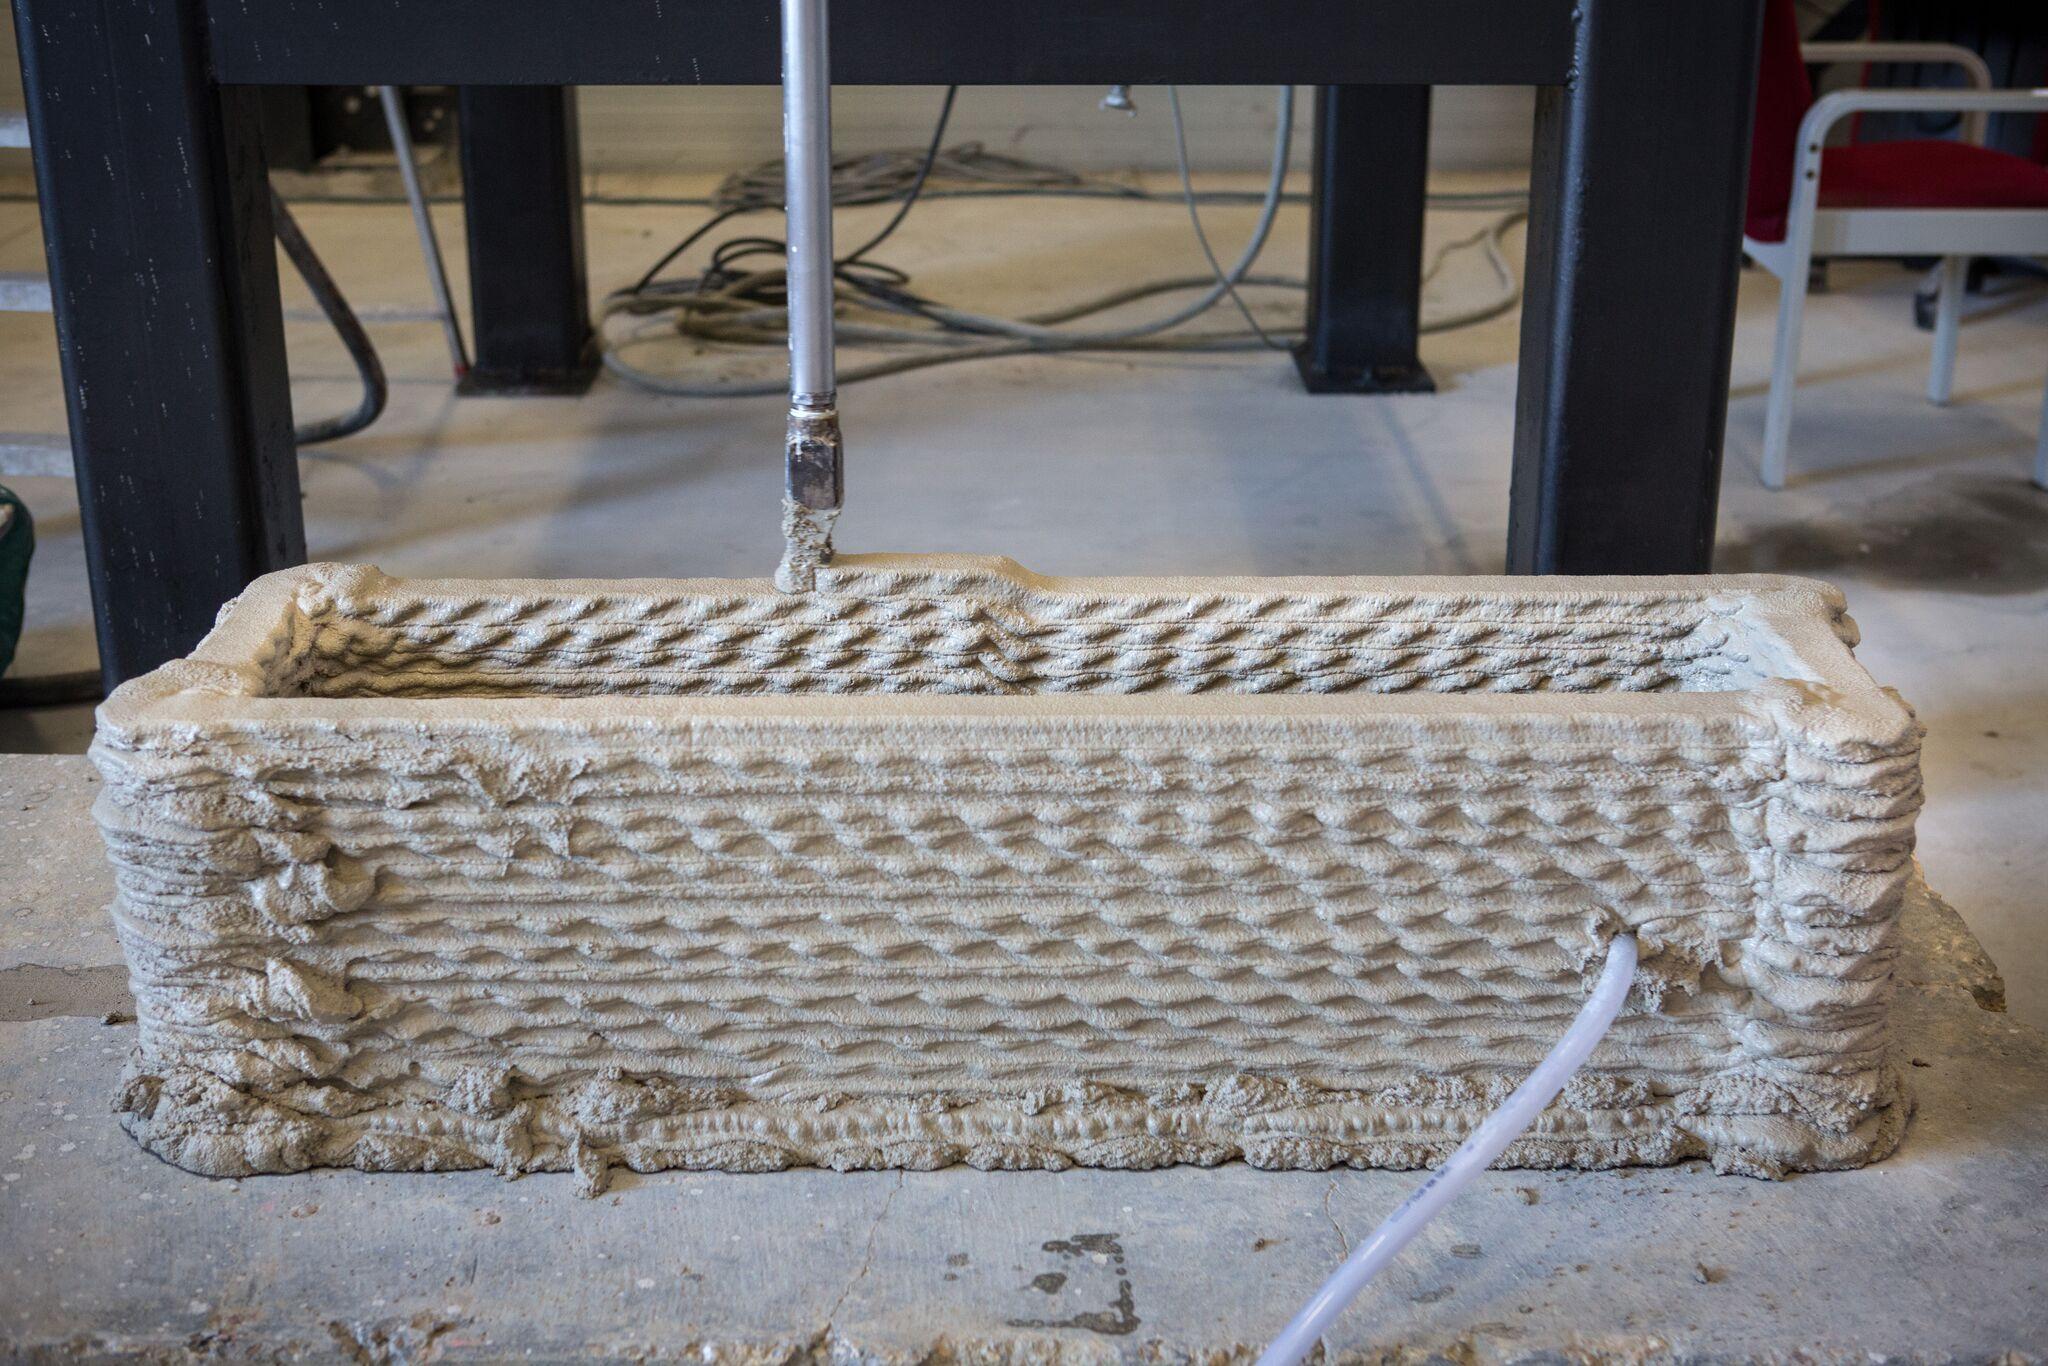 3D Printed Construction Milestone Achieved